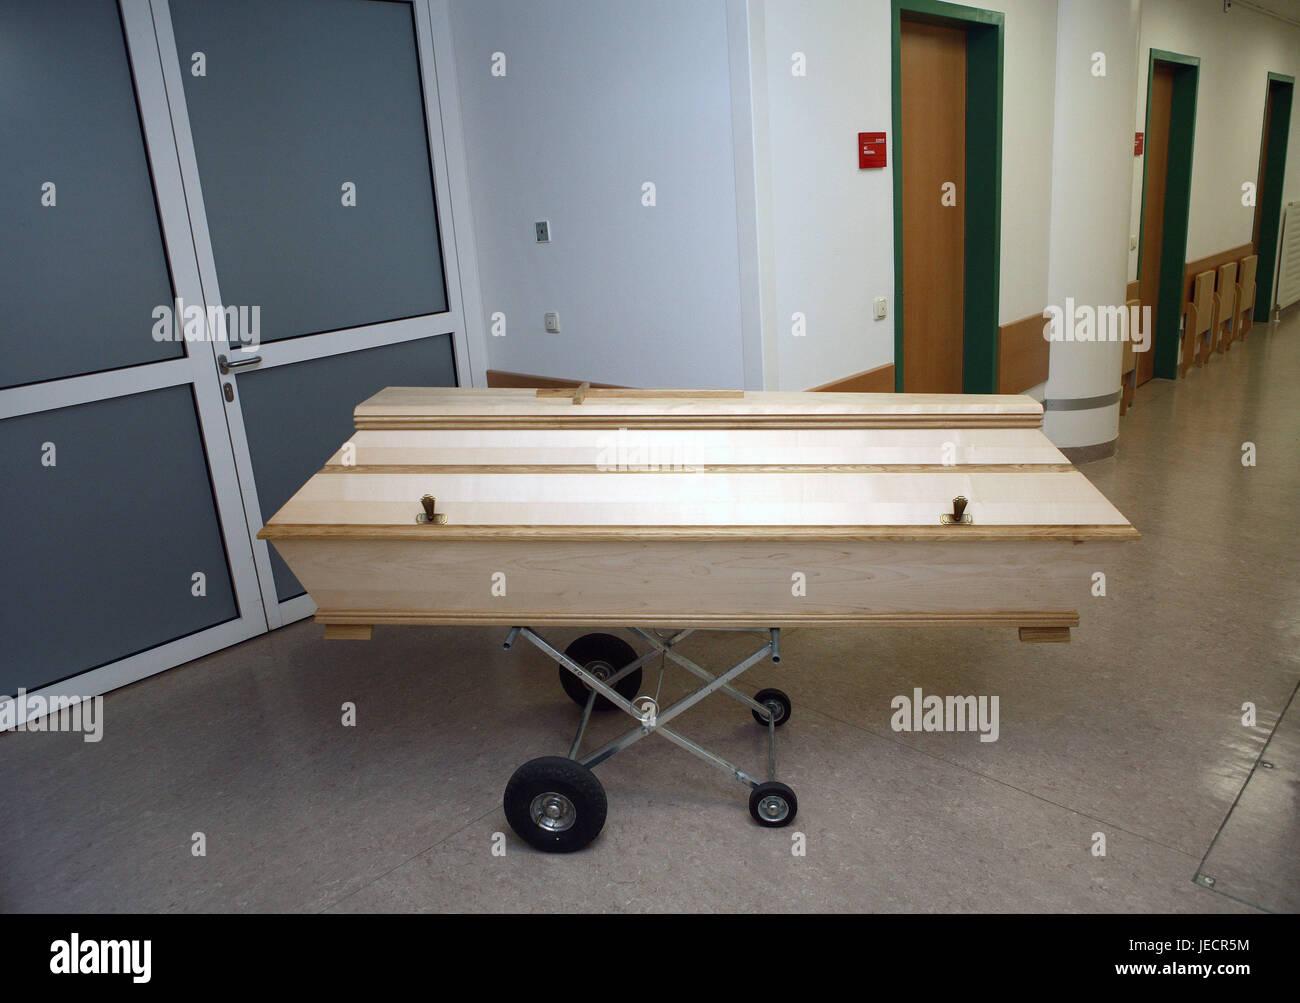 Hospital, pathological-anatomical department, Prosektur, hall, rolling carriage, coffin, overpass, medicine, hospital - Stock Image